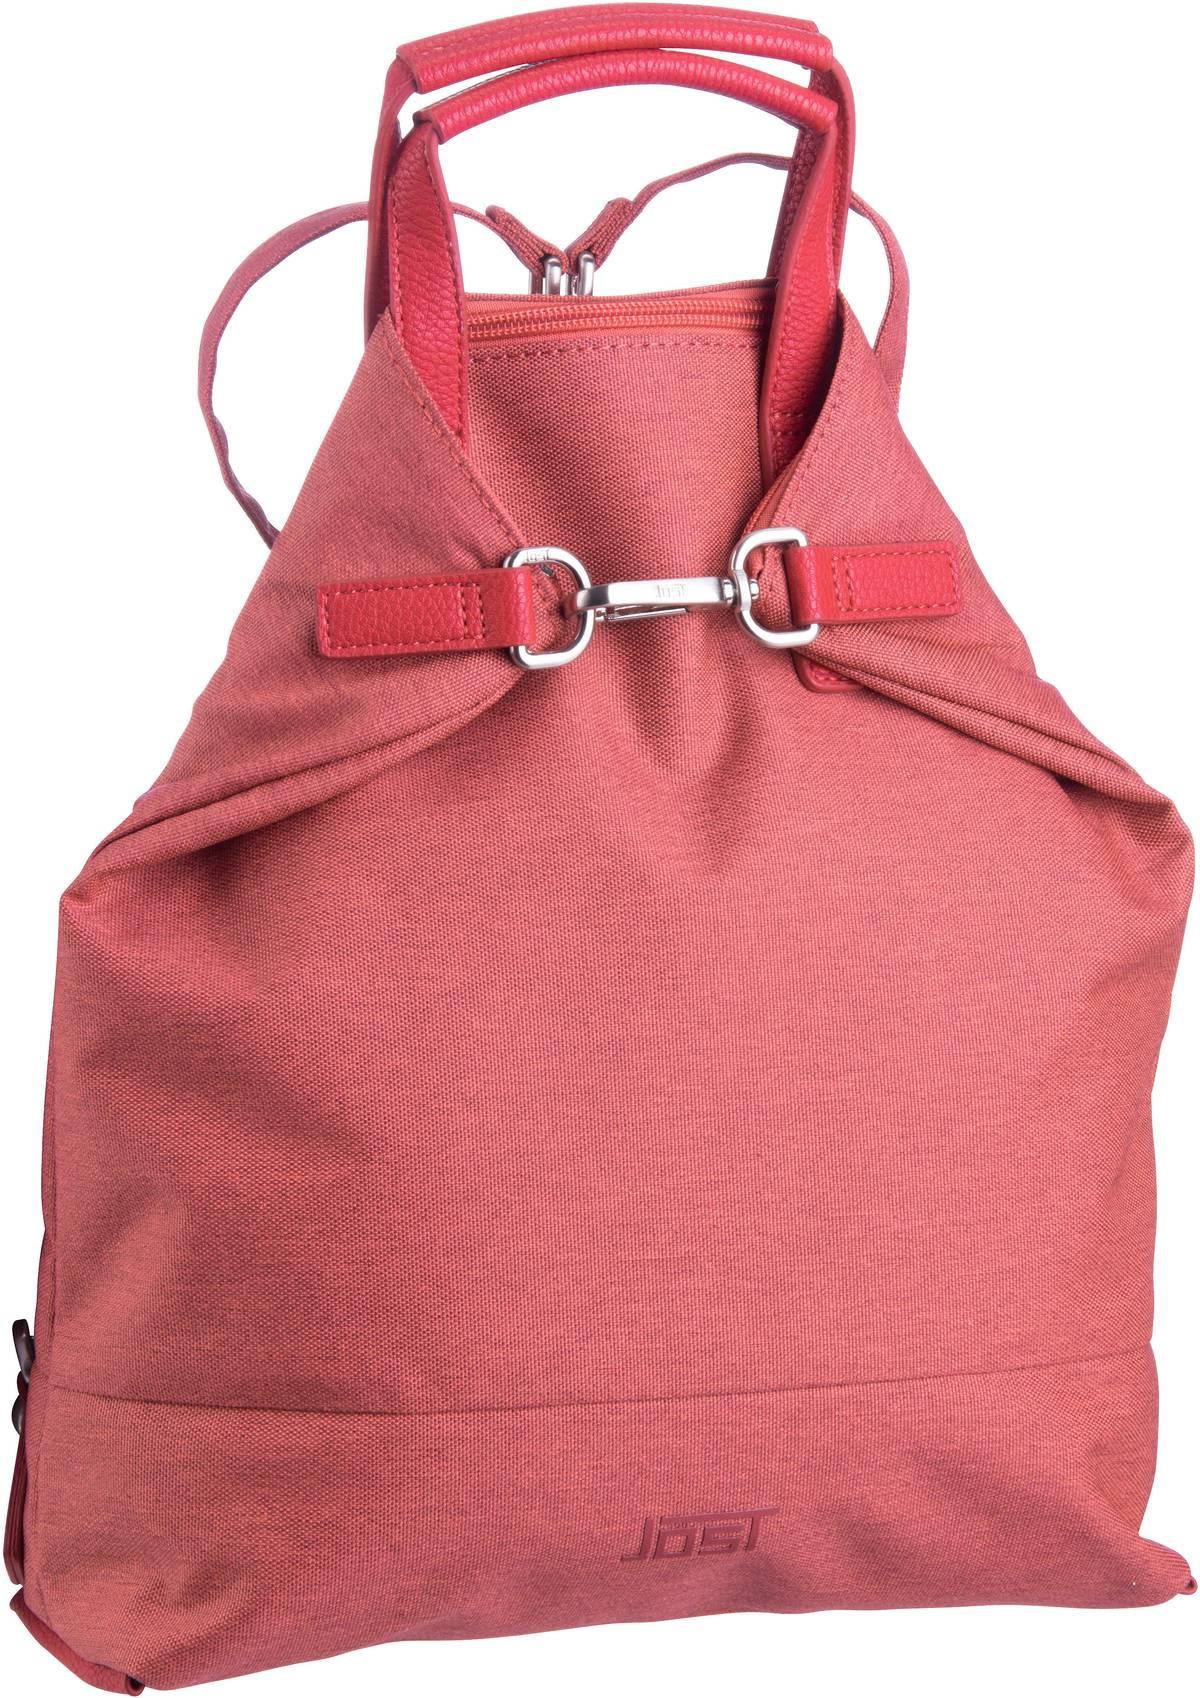 Jost Rucksack / Daypack 1126 X-Change Bag XS k